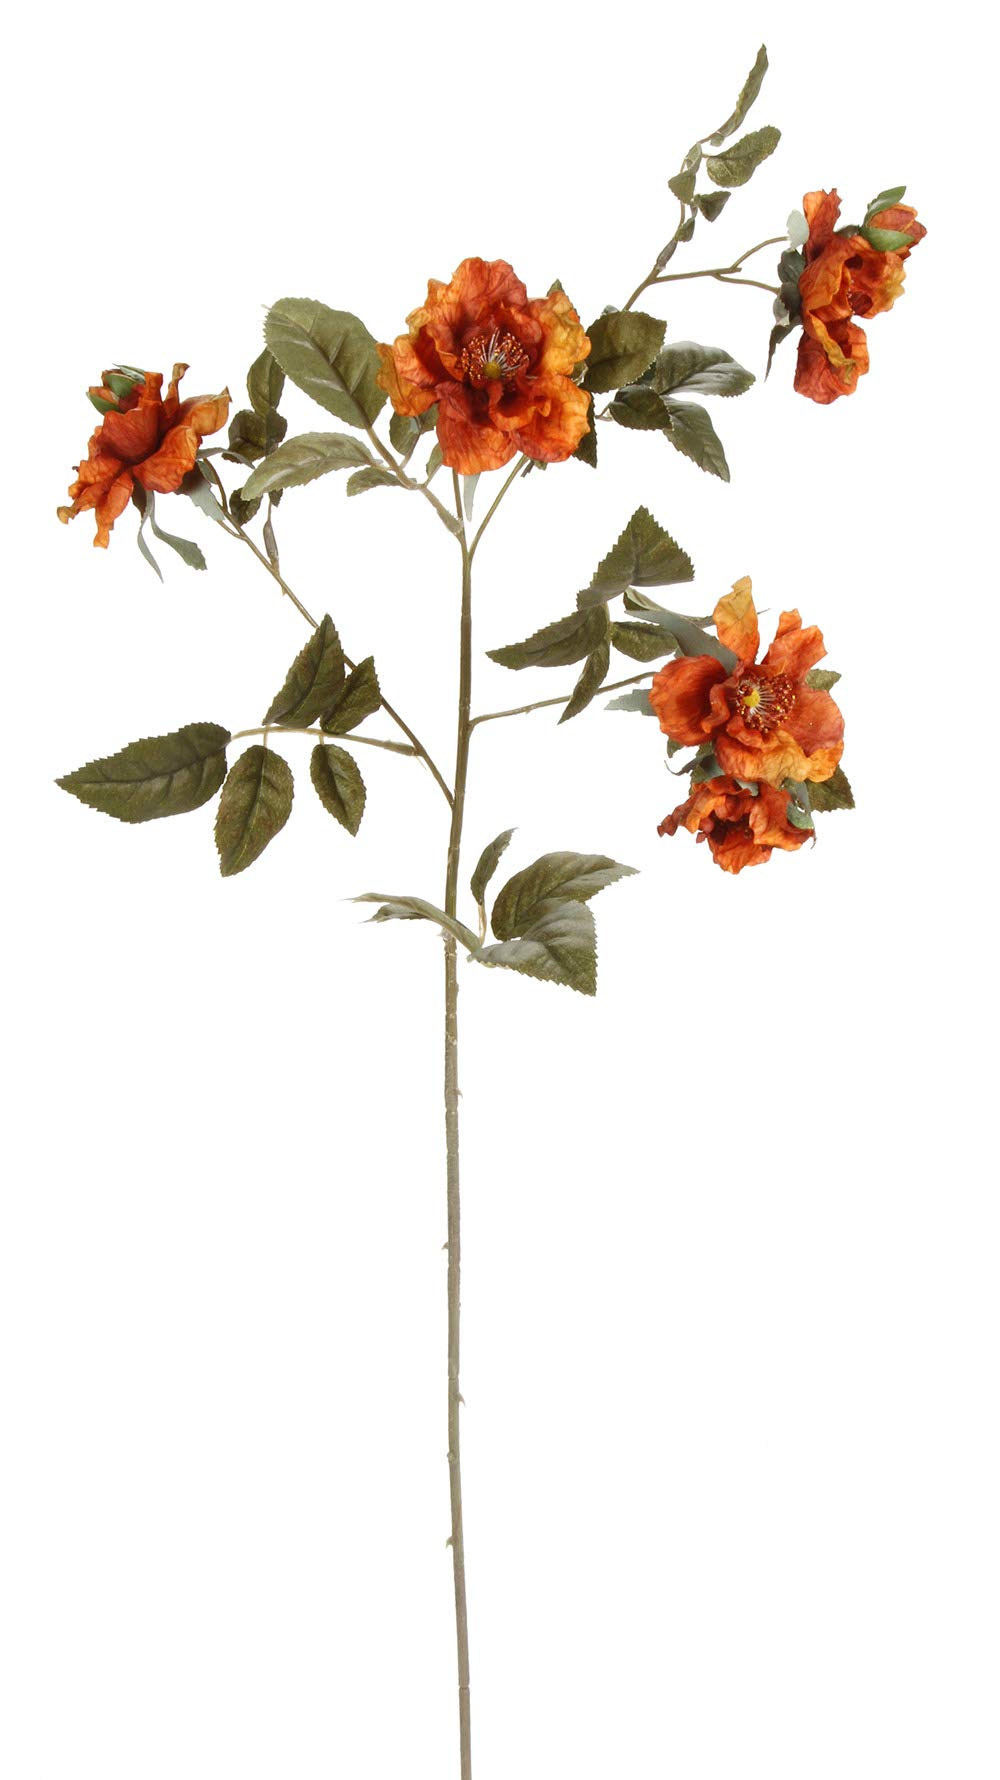 Darice SQ13G20208-YJ/AL Everyday Long Stem Wild Rose Spray X3, 28'', Copper